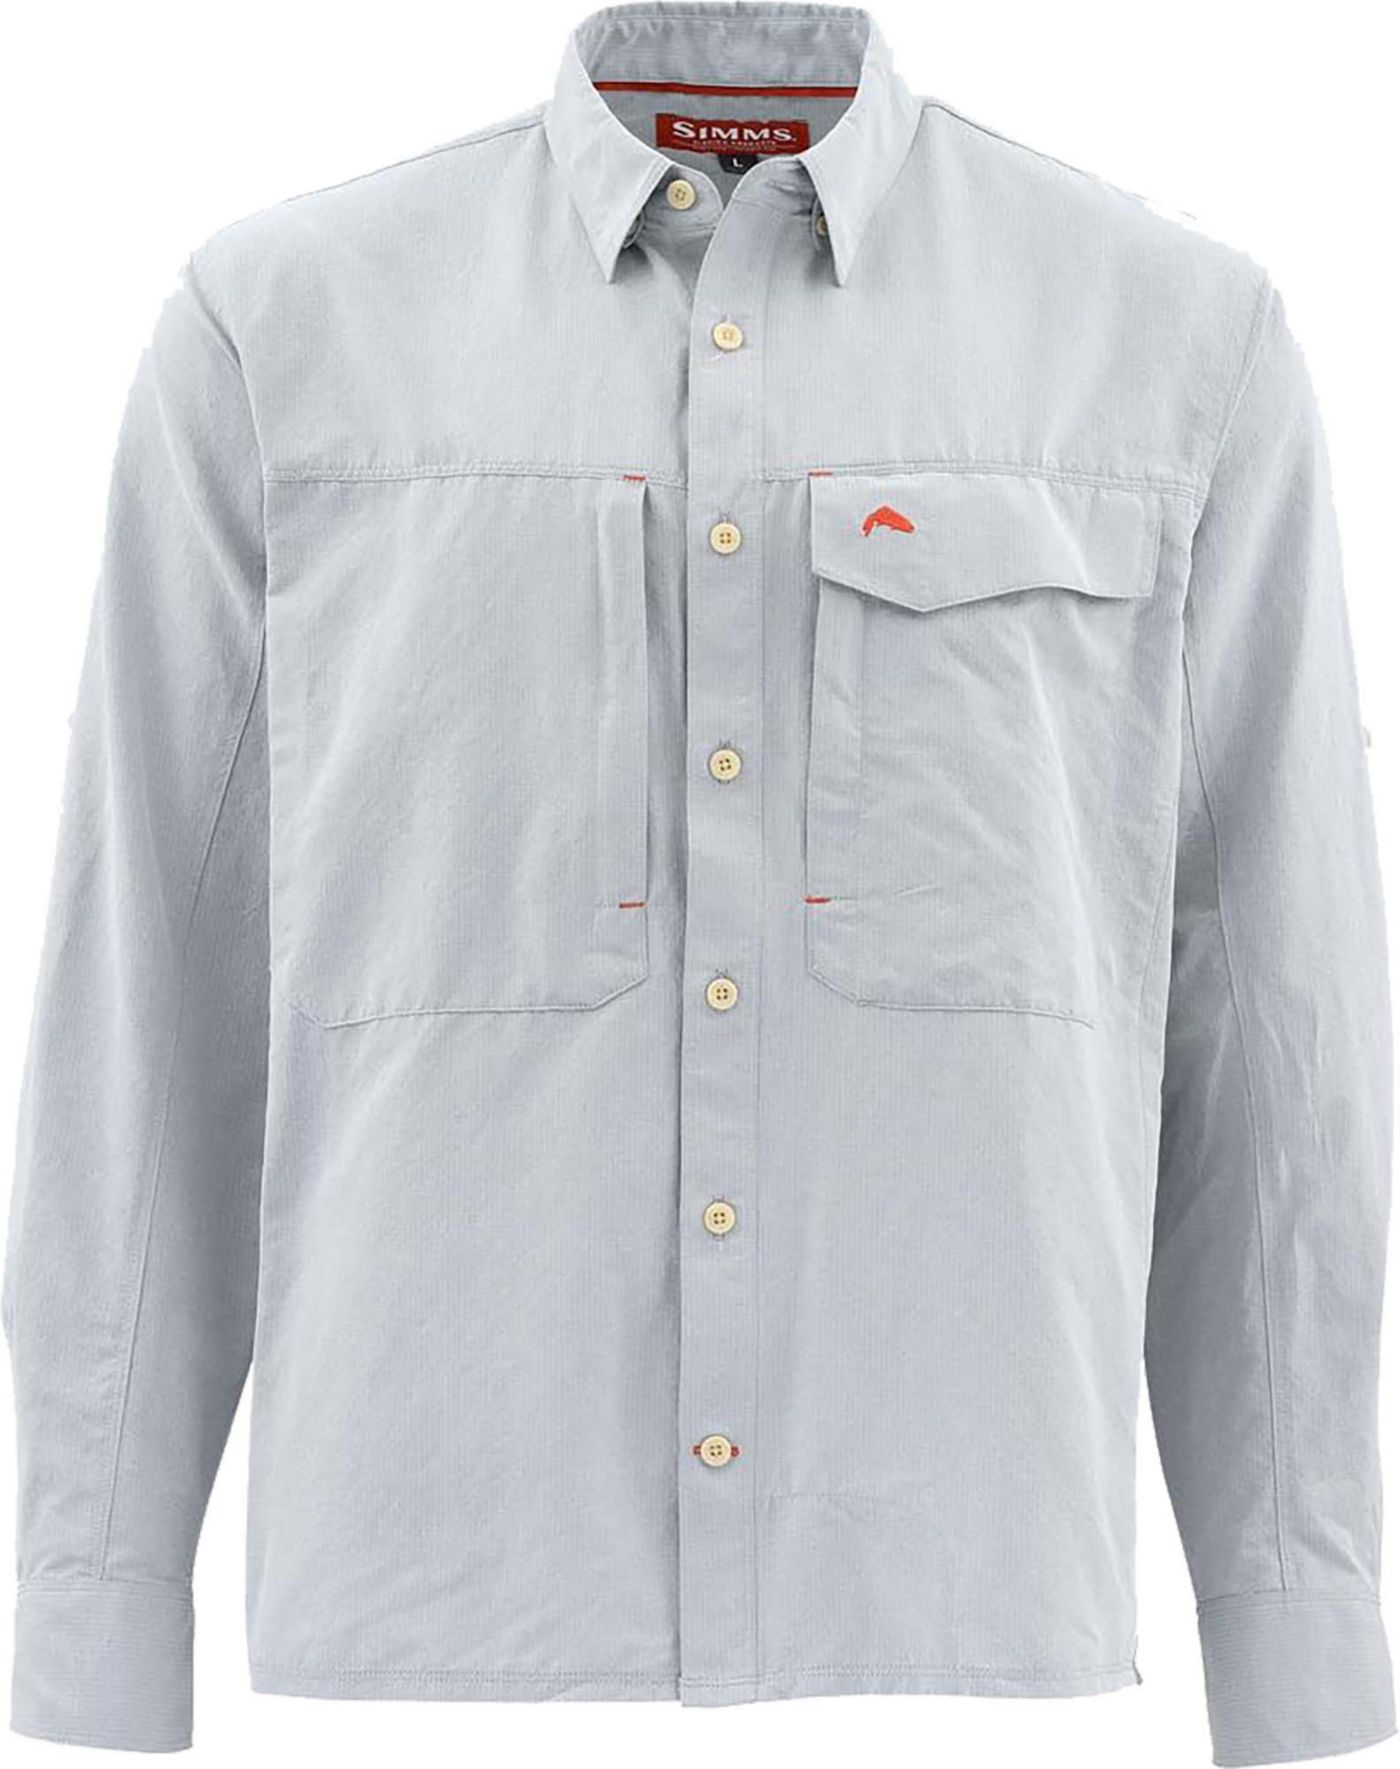 Simms Men's Guide Marl Long Sleeve Button Down Shirt